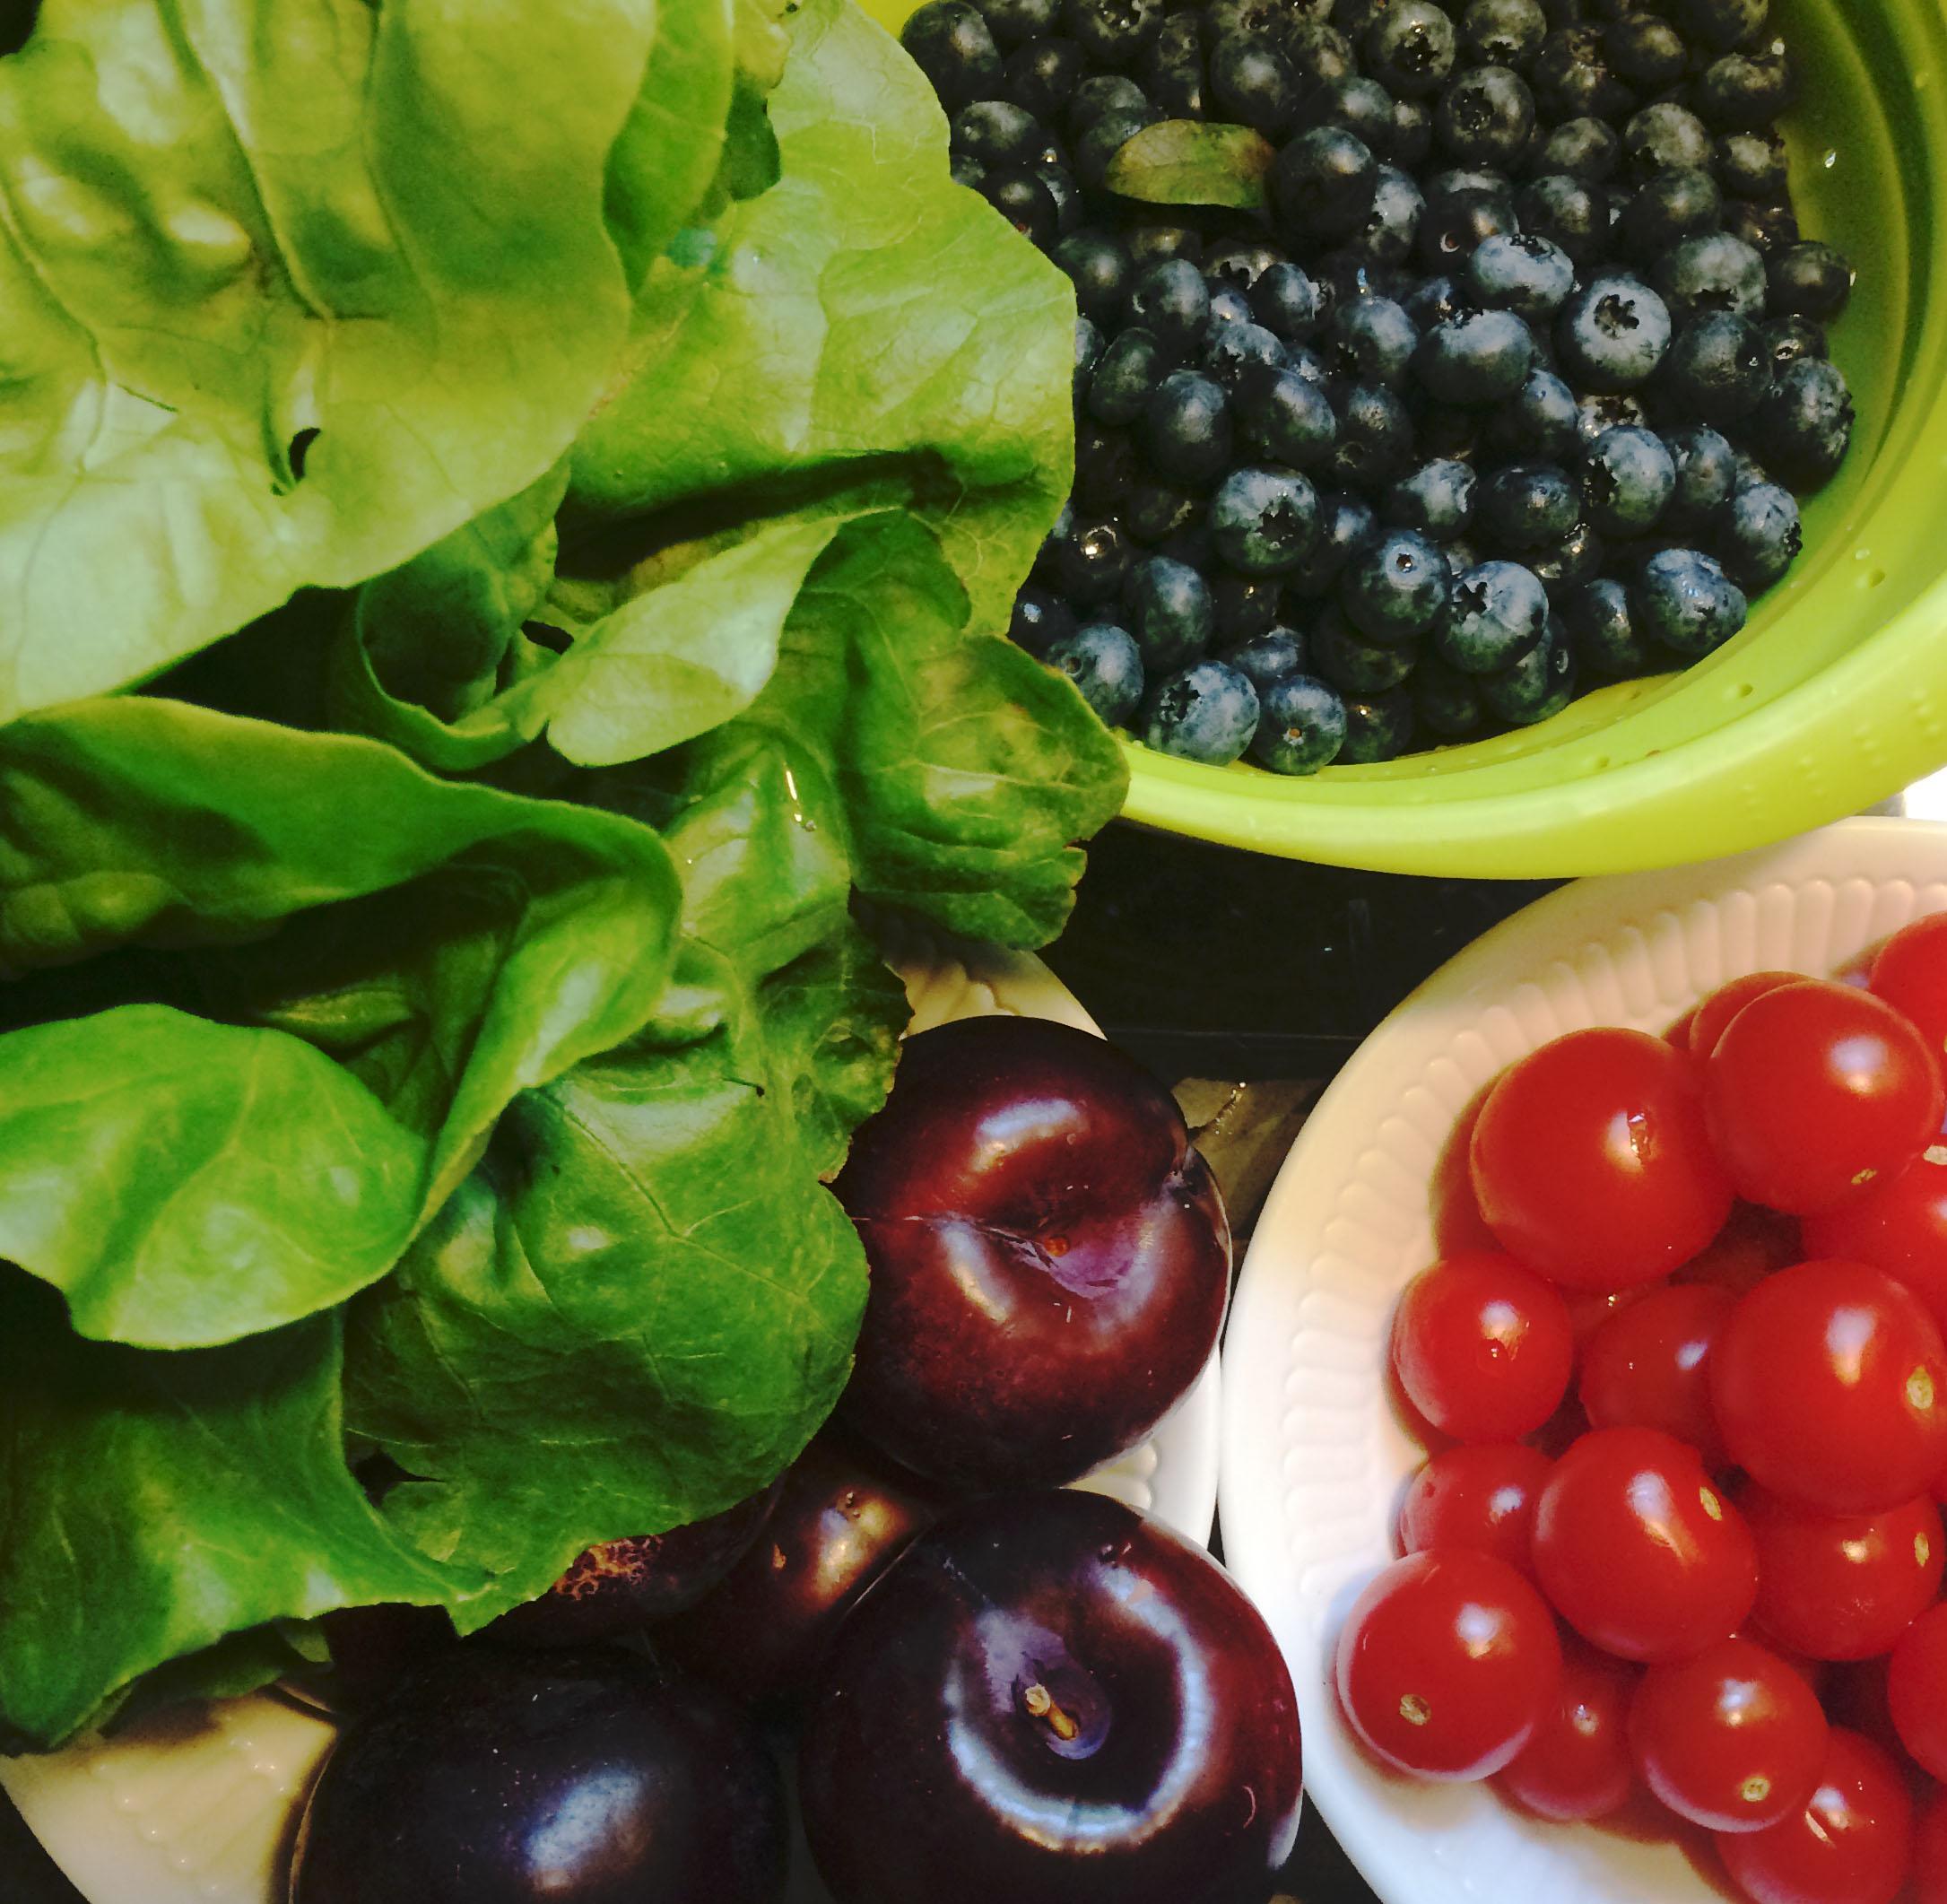 fruits and vegies